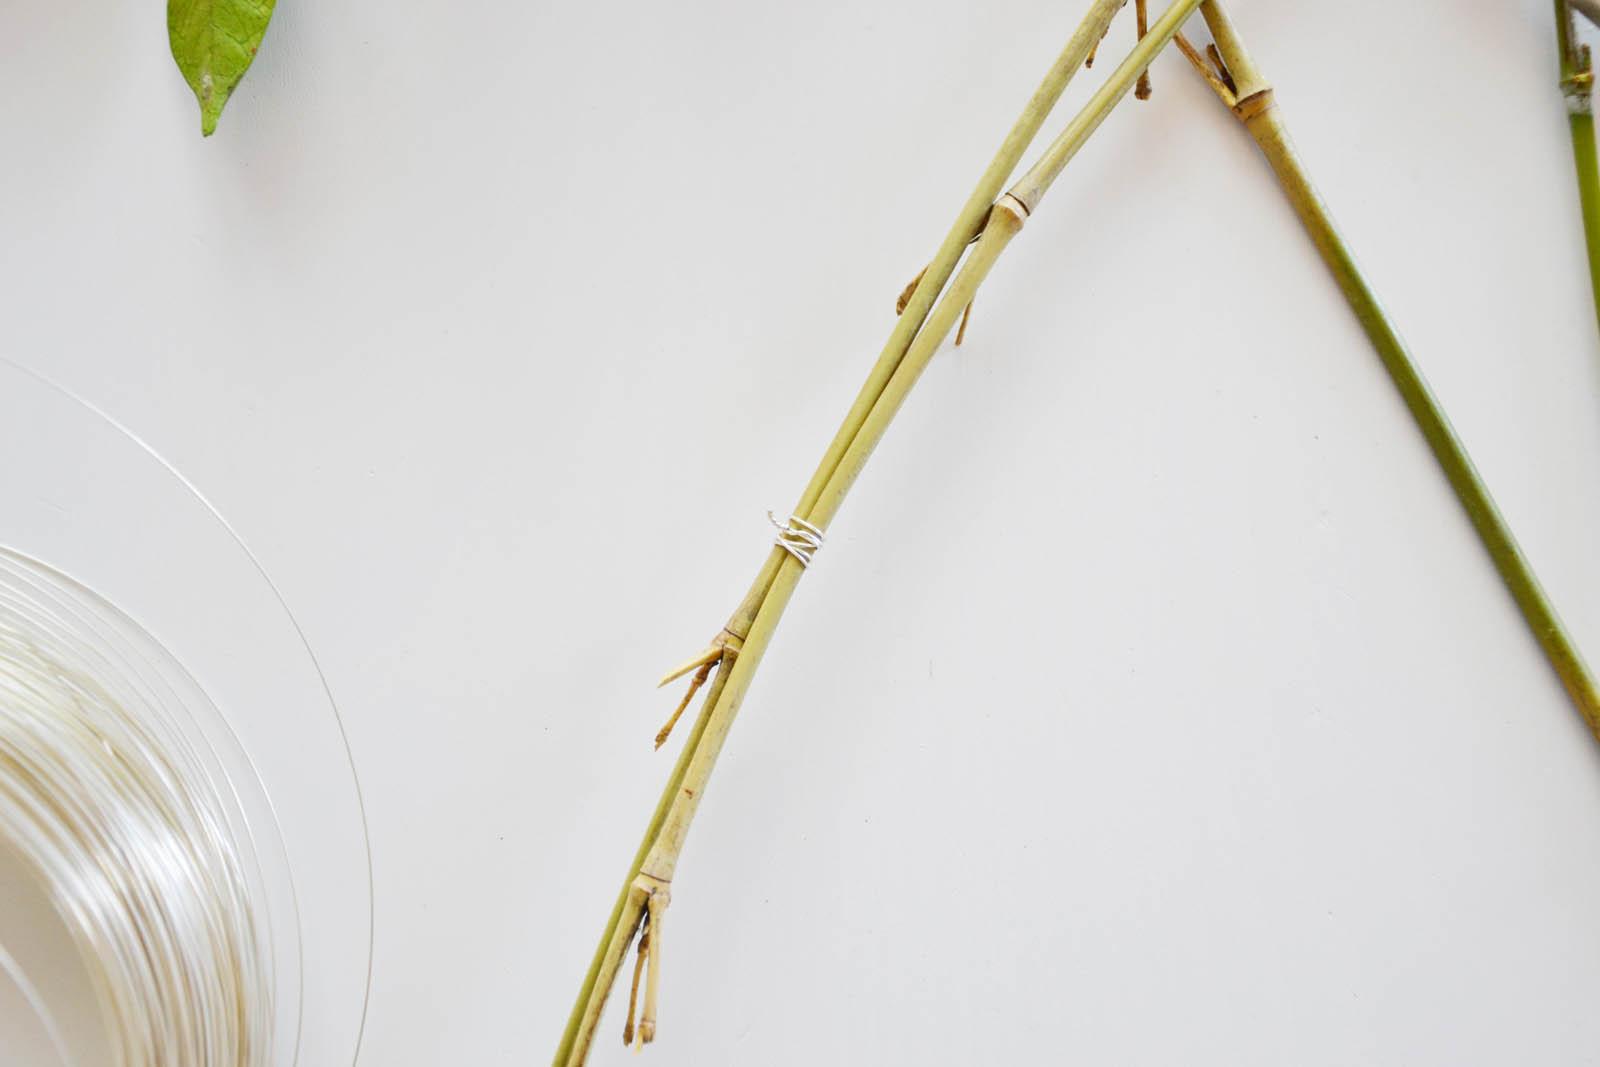 Ghirlanda-Viridea-occorrente2